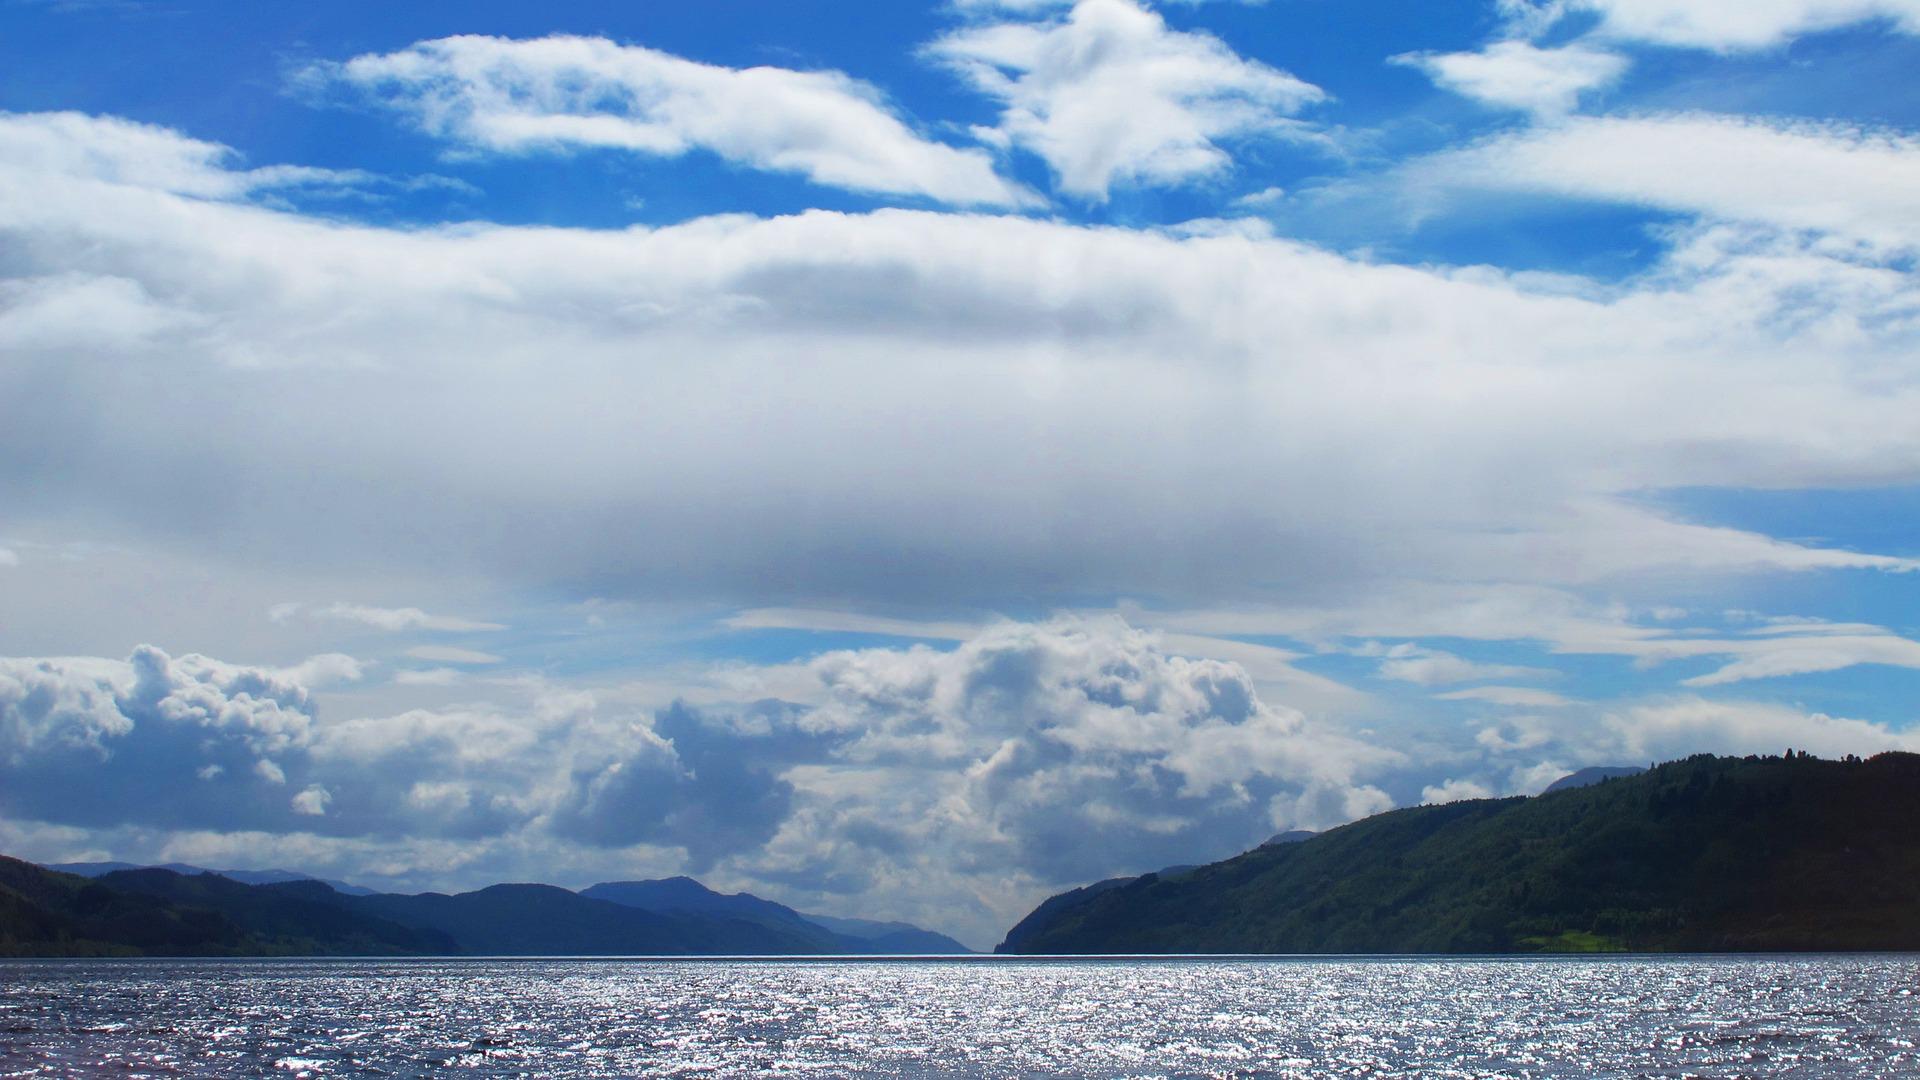 Une photo du Loch Ness